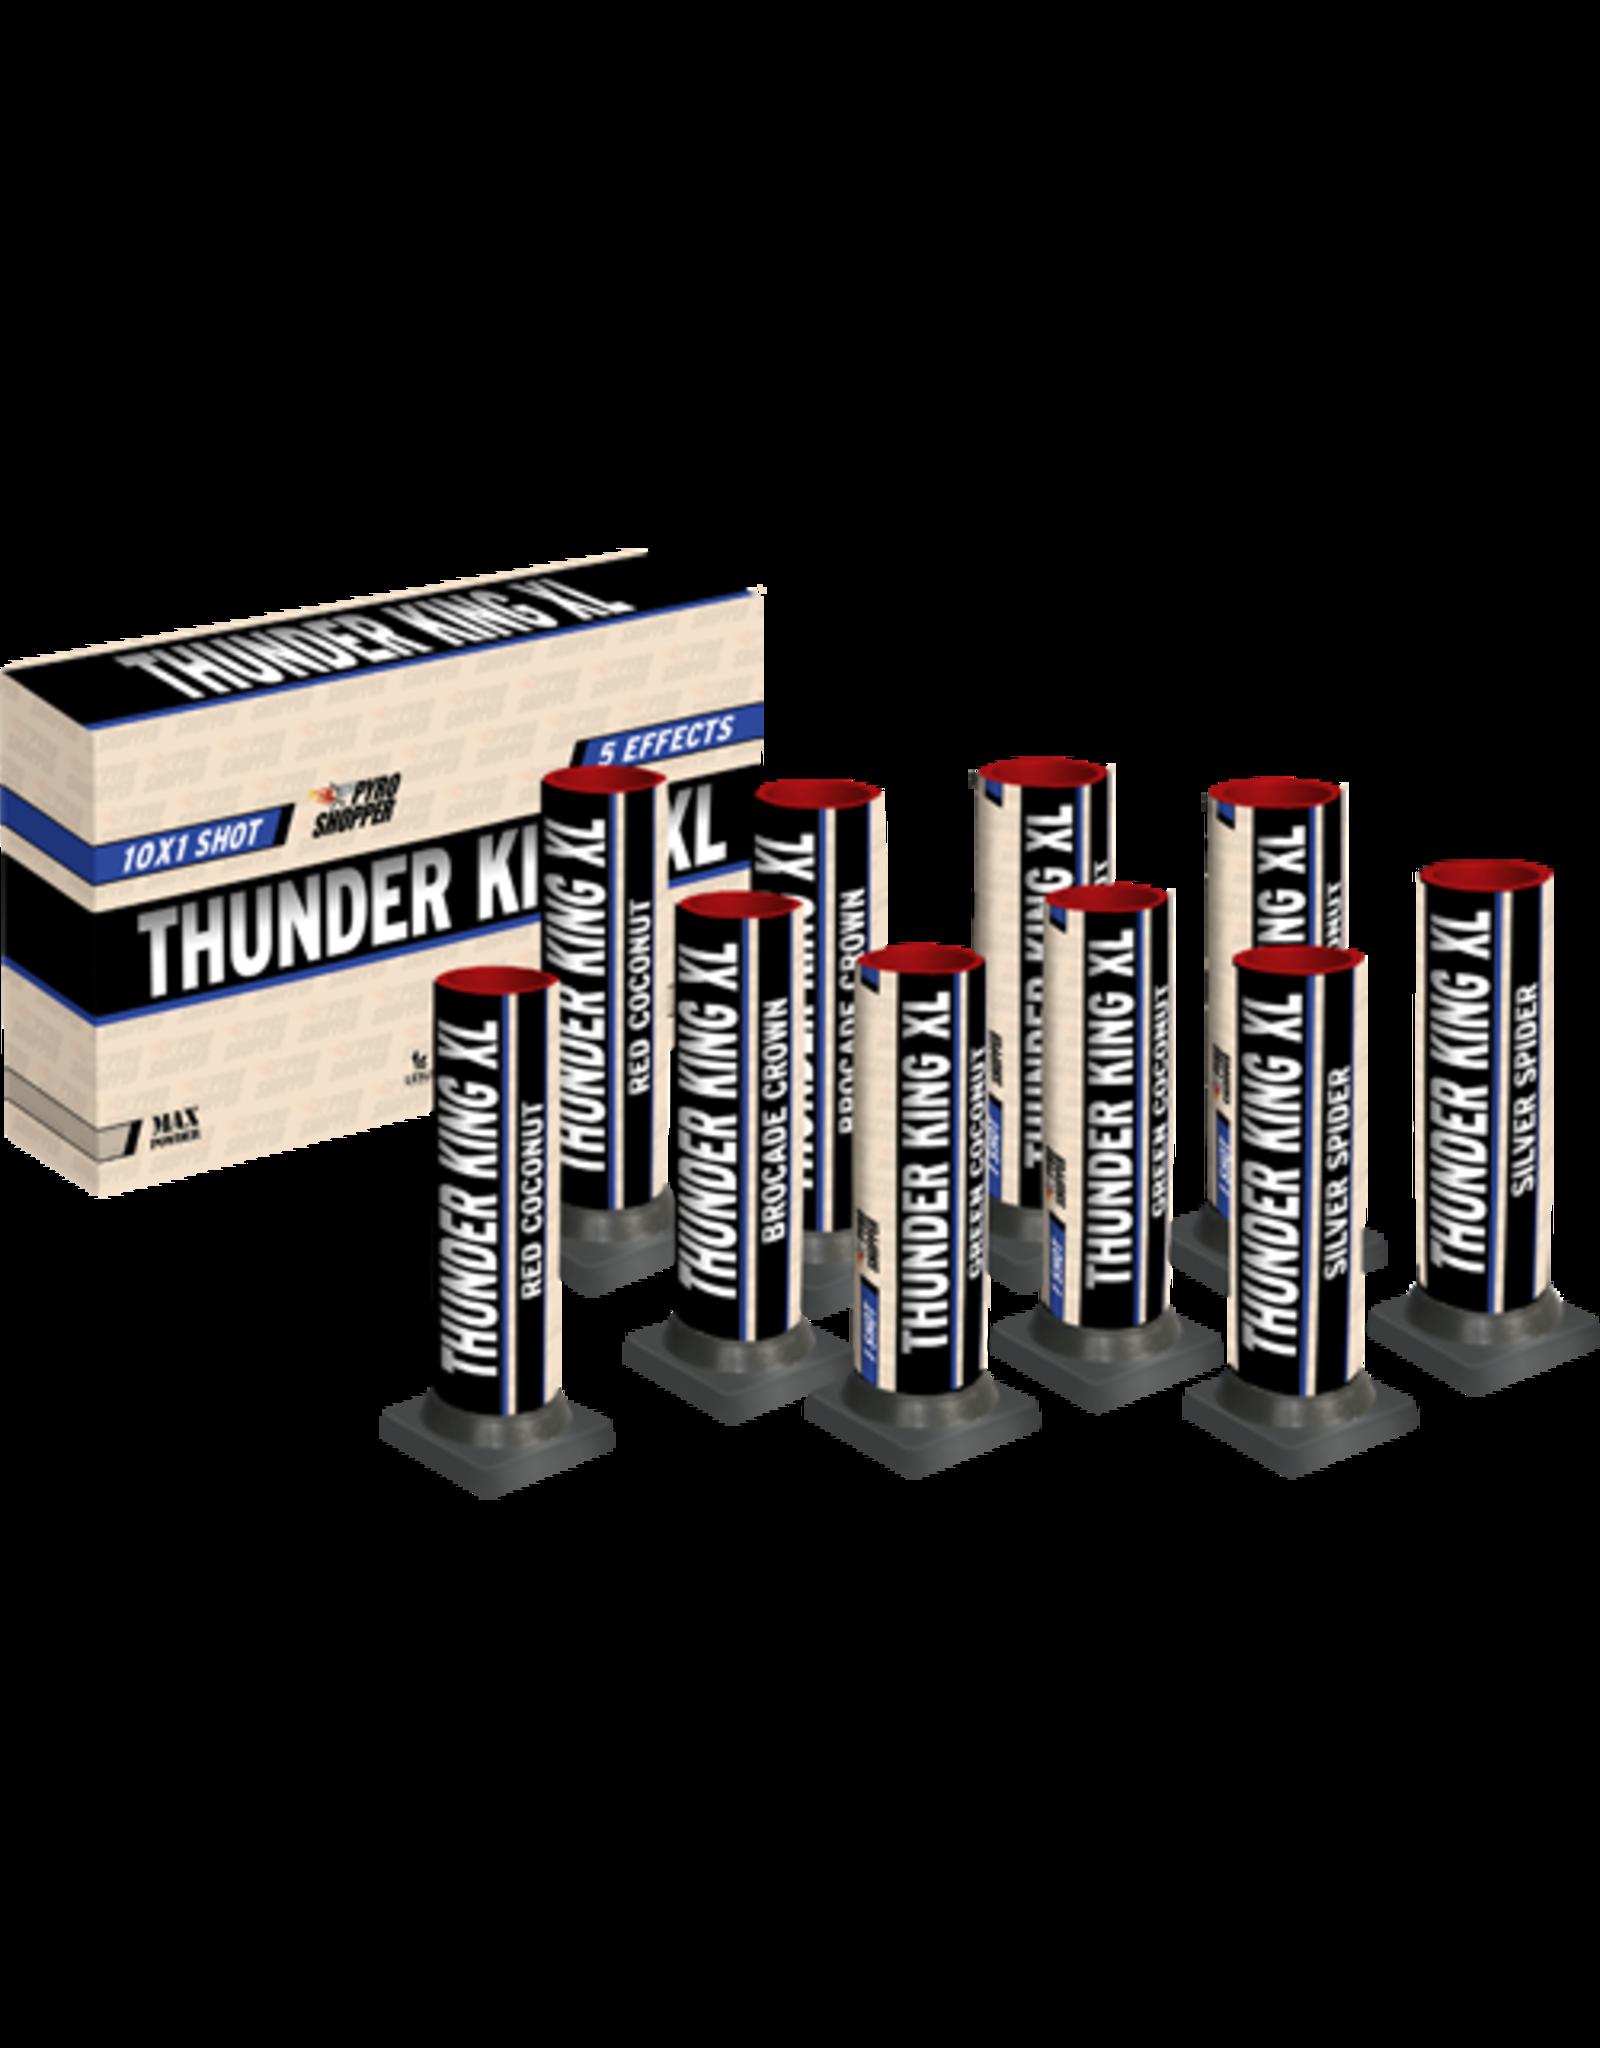 Lesli Vuurwerk Thunderking XL